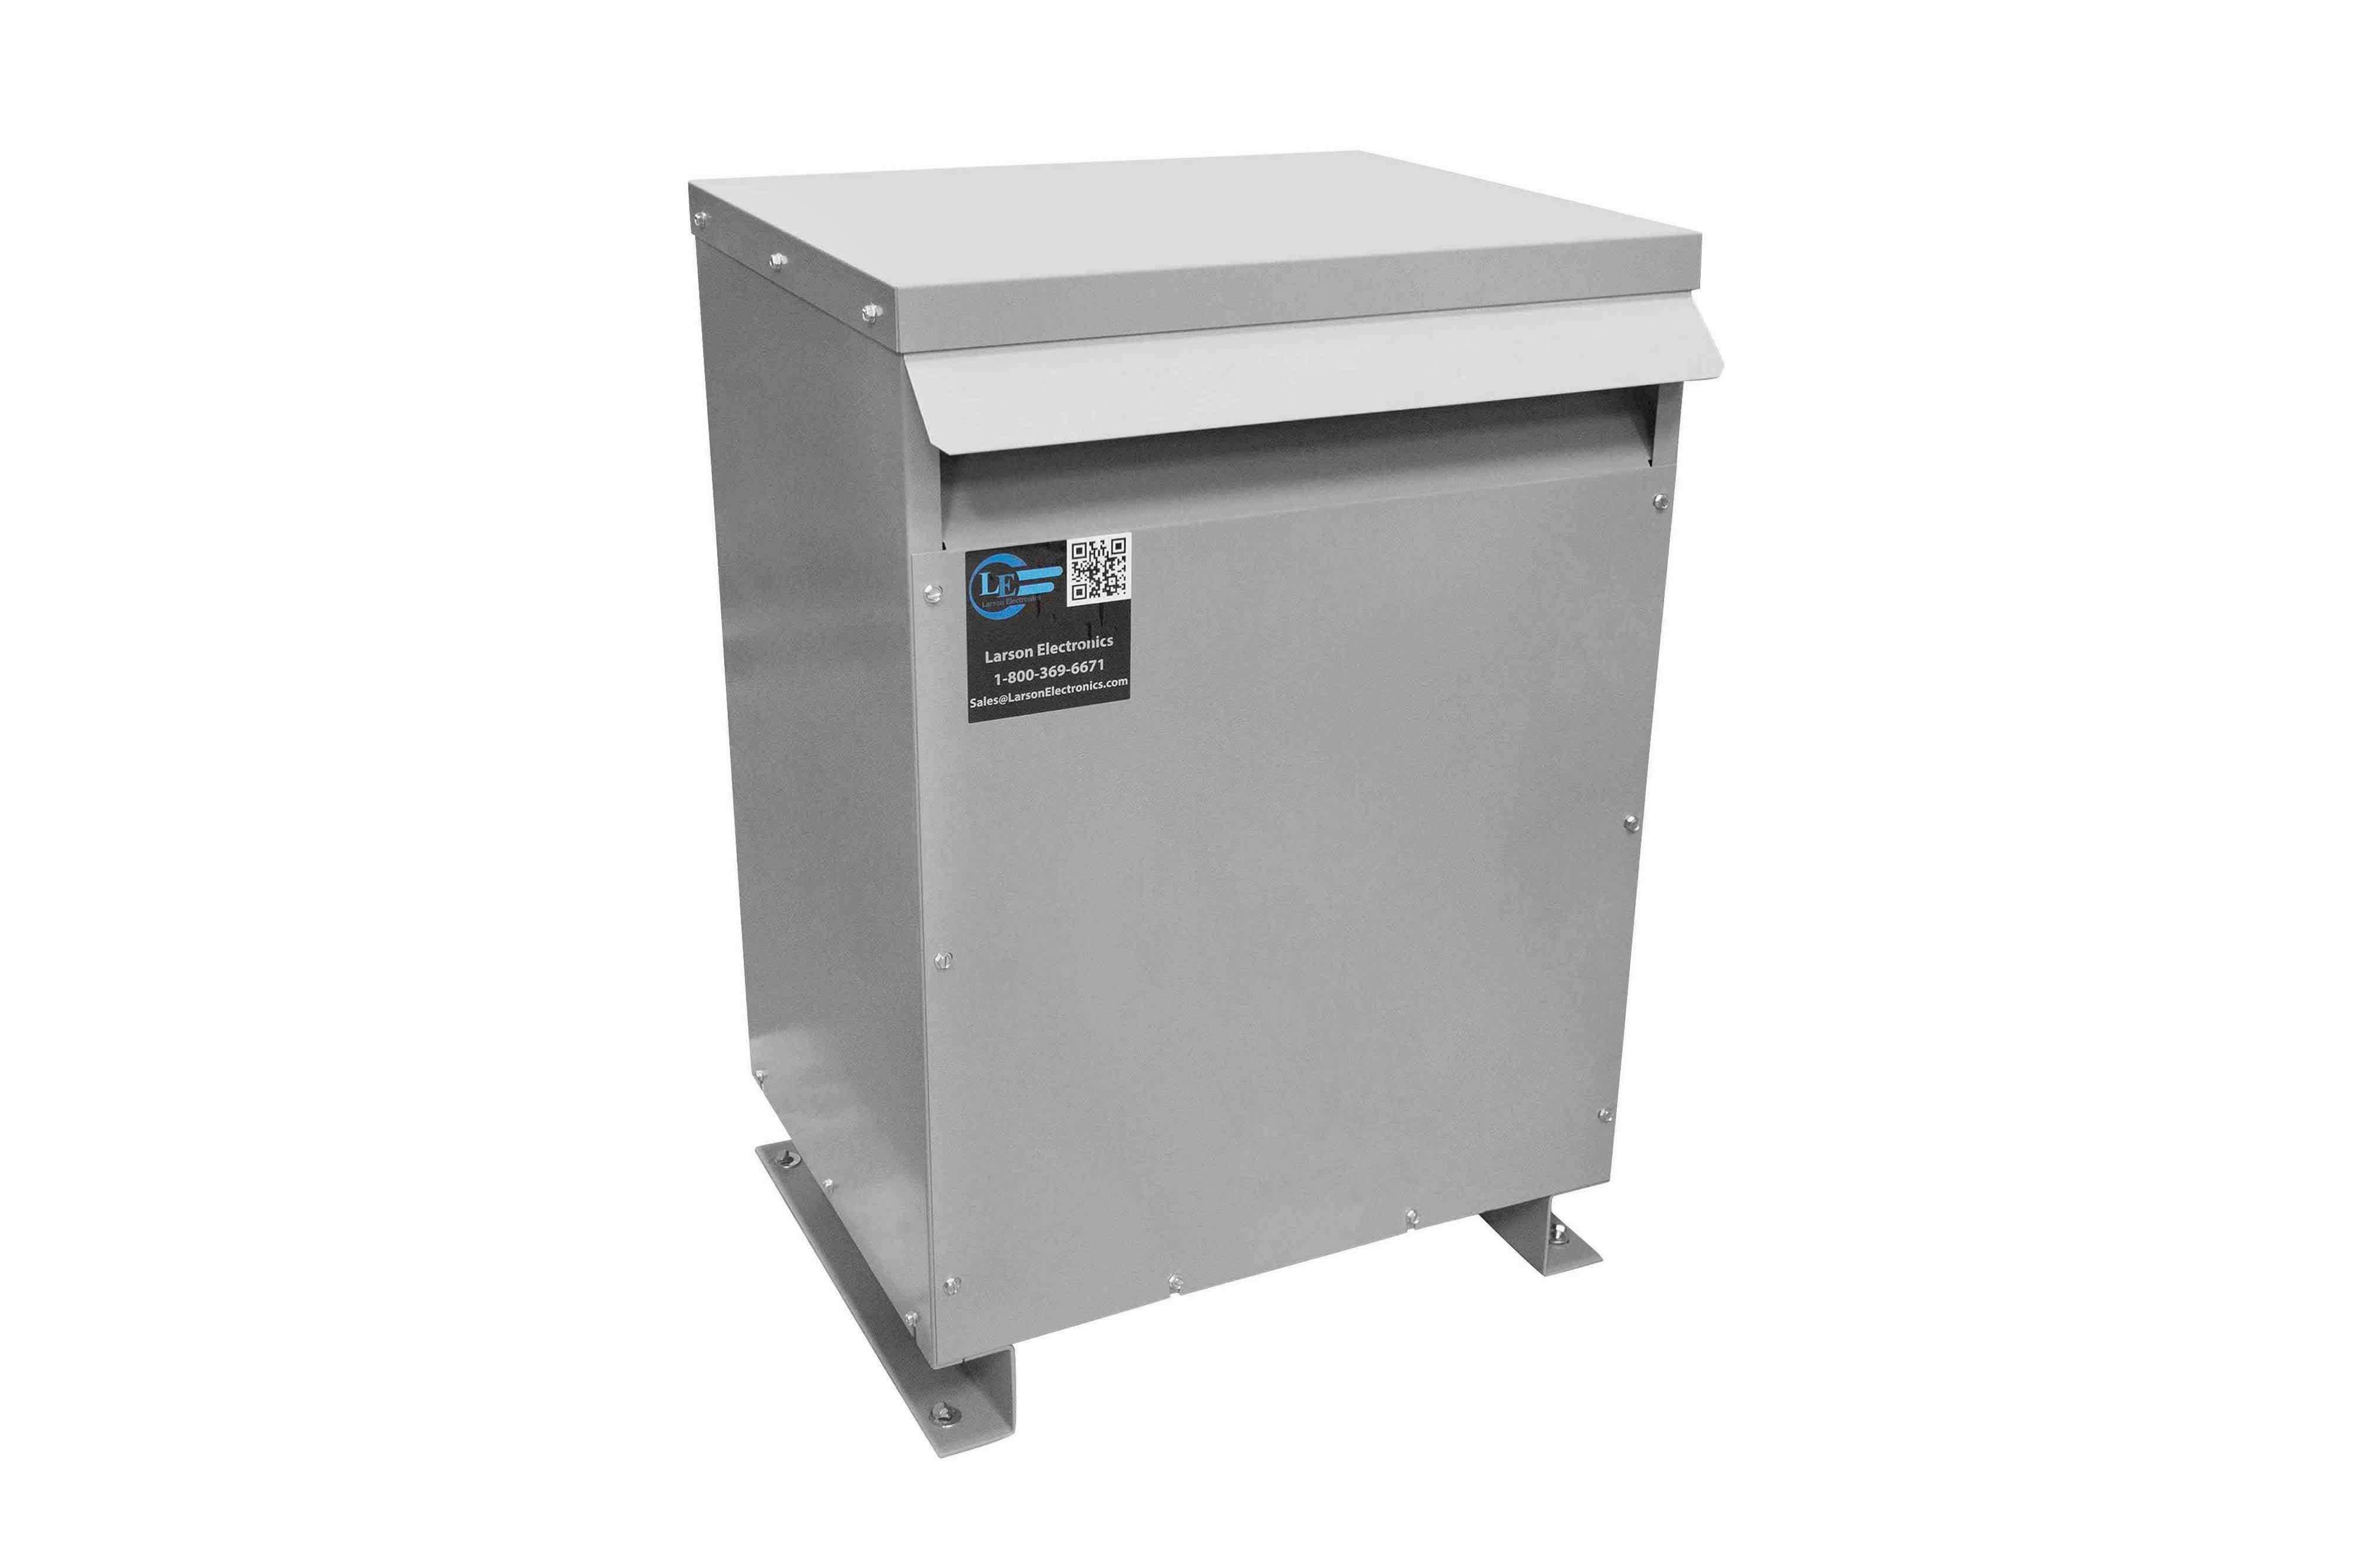 45 kVA 3PH Isolation Transformer, 600V Wye Primary, 415V Delta Secondary, N3R, Ventilated, 60 Hz